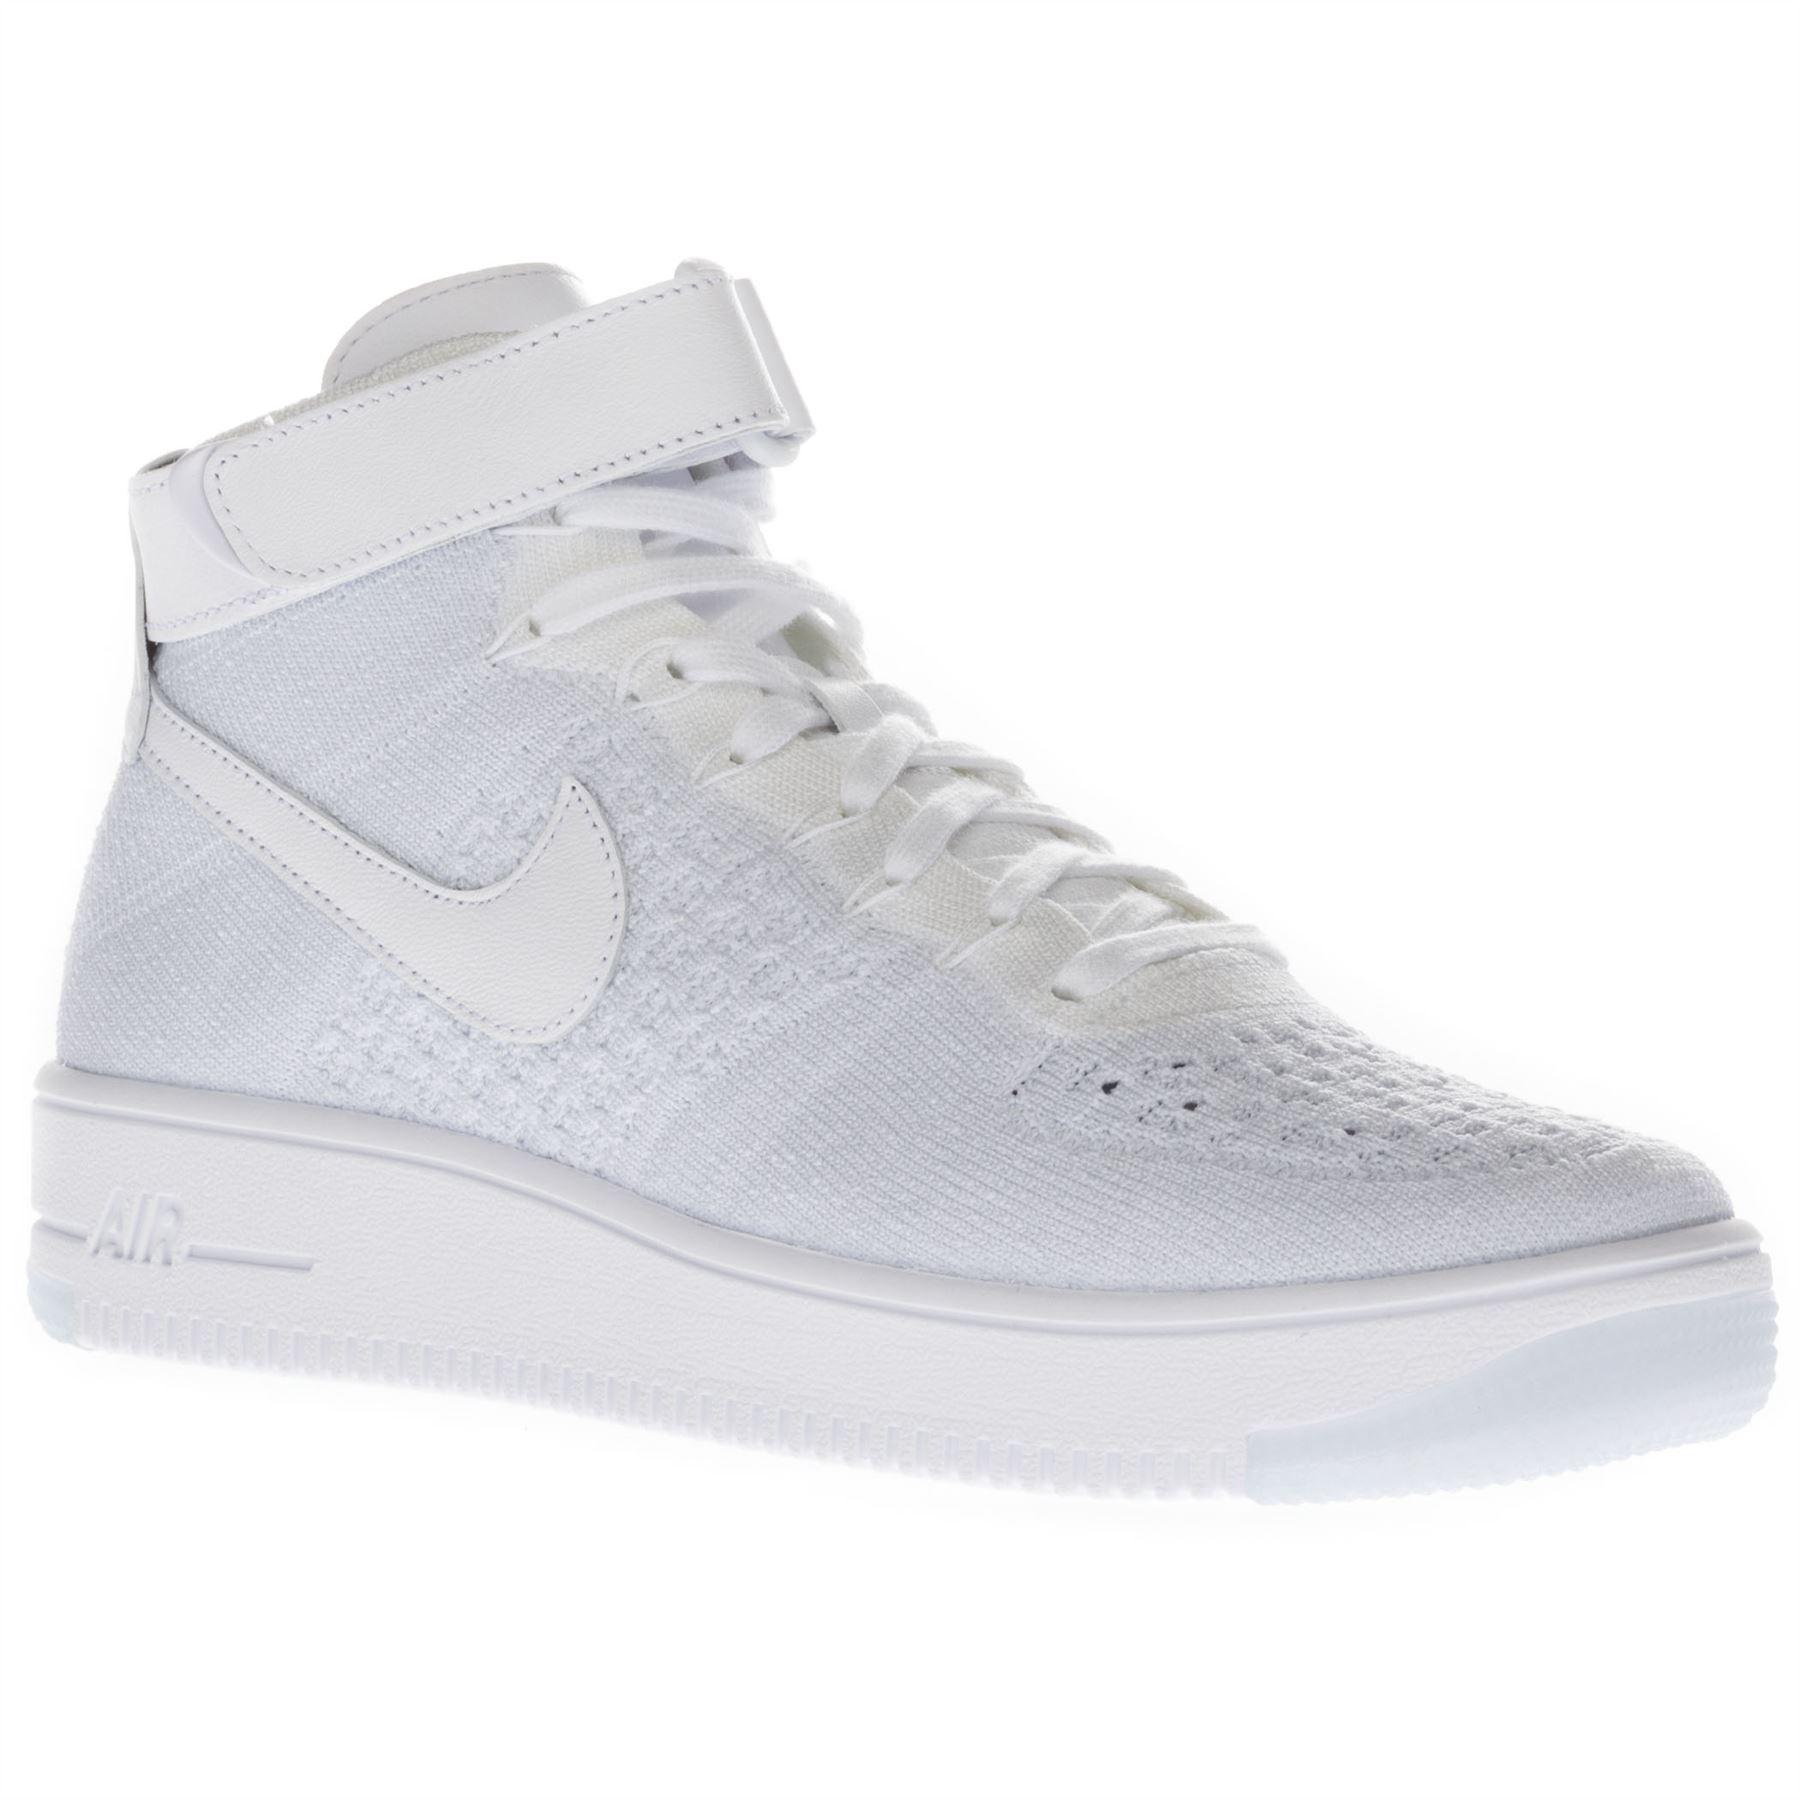 Nike Nike Nike WOMEN'S AF1 Flyknit Hi Top Running sportive casual da palestra scarpe da ginnastica Nero Bianco | Prima il cliente  | Di Progettazione Professionale  | Abbiamo ricevuto lodi dai nostri clienti.  | Uomo/Donne Scarpa  | Sig/Sig Ra Scarpa  | Maschi 6c9729